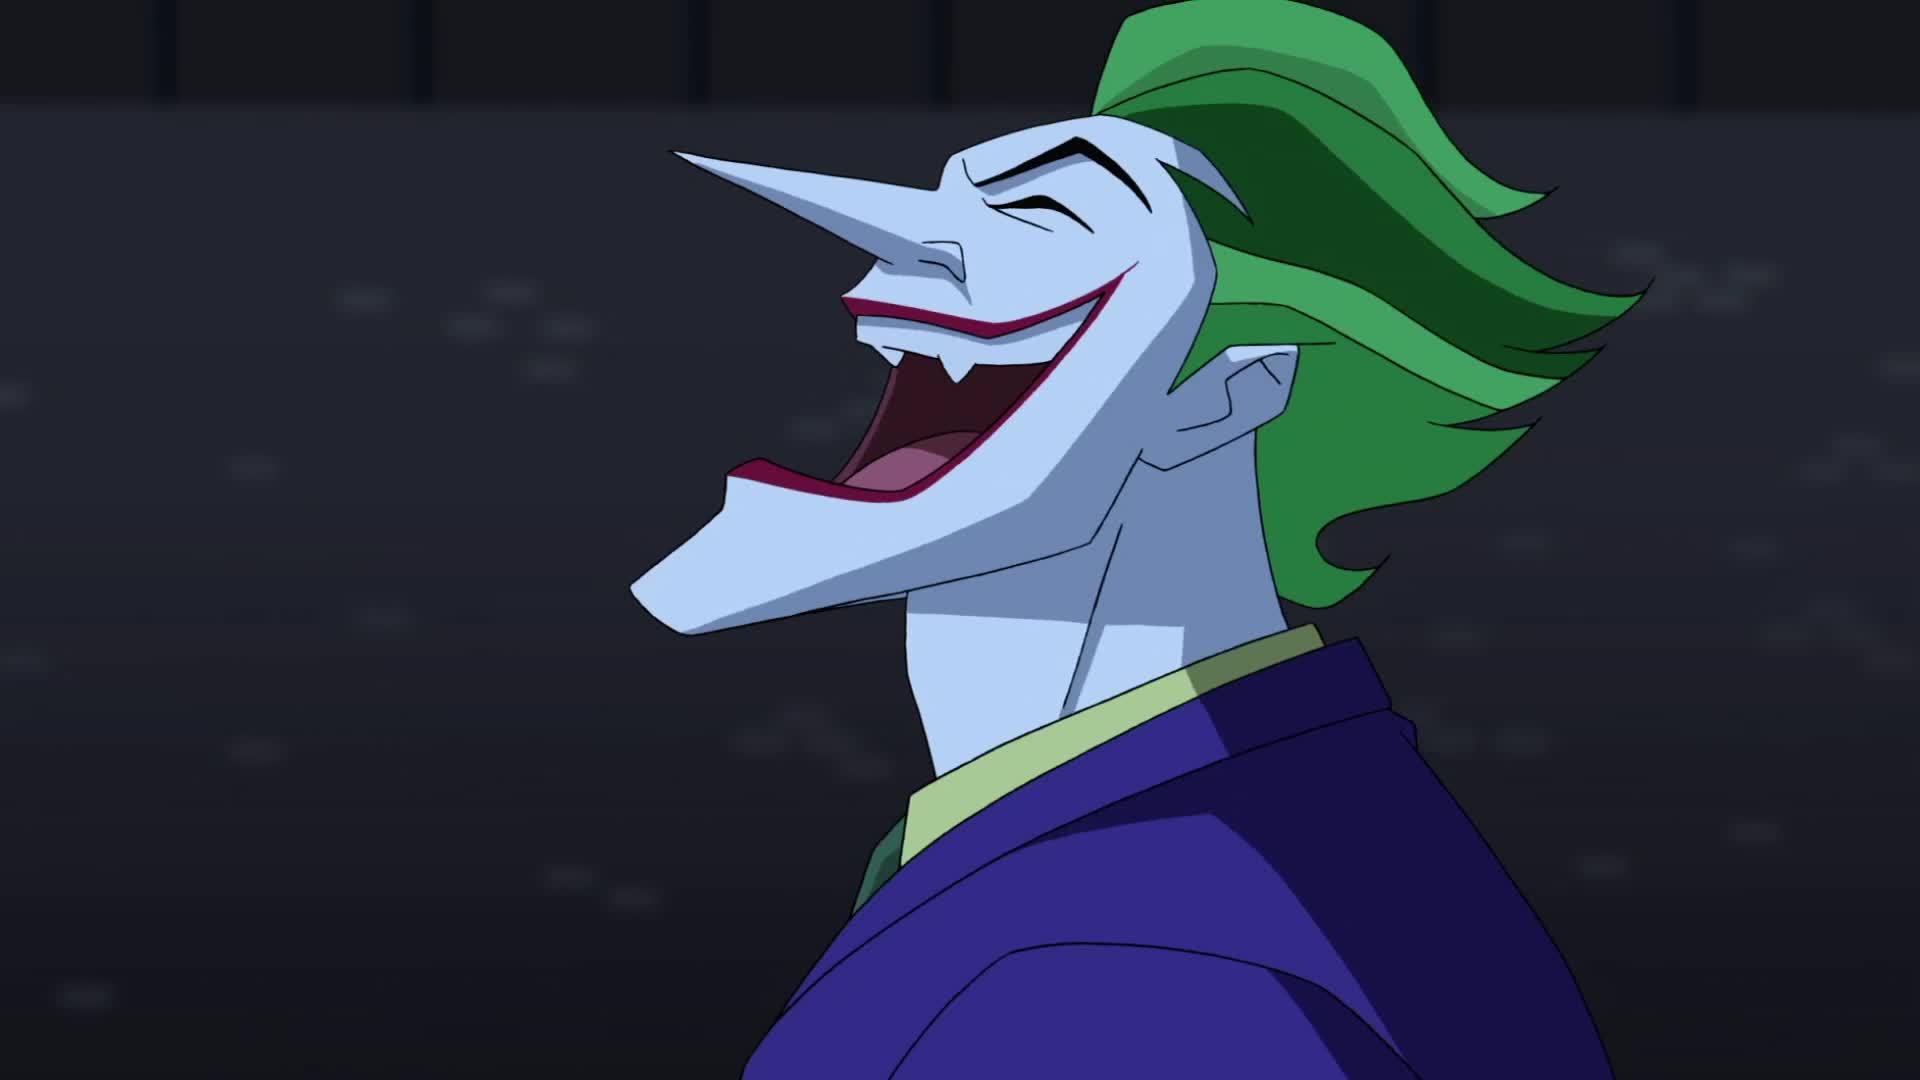 Amazing Batman Unlimited: Monster Mayhem Pictures & Backgrounds